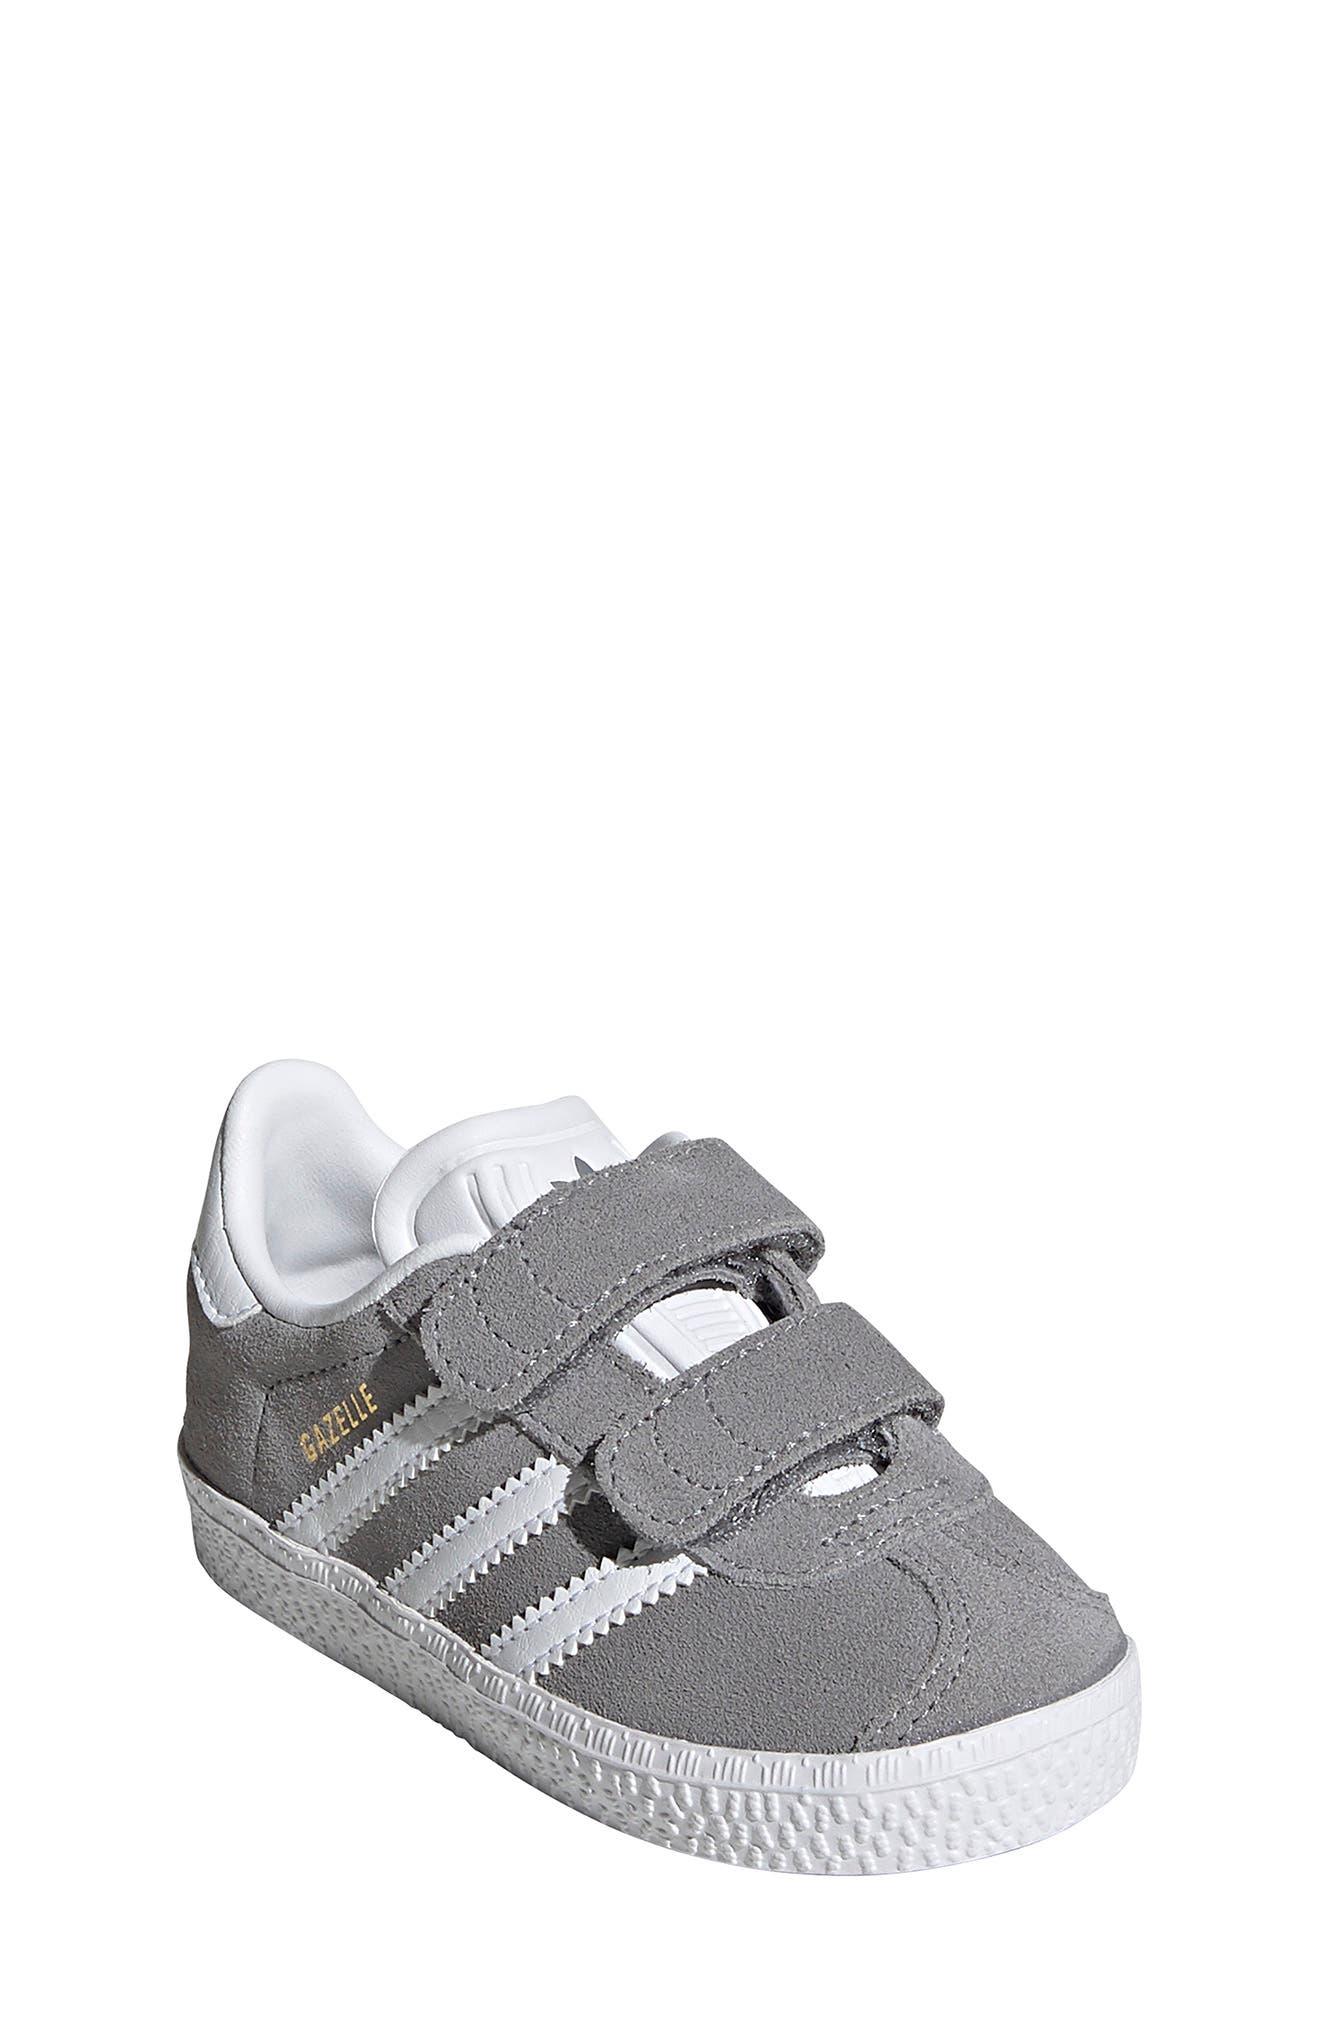 baby adidas gazelle